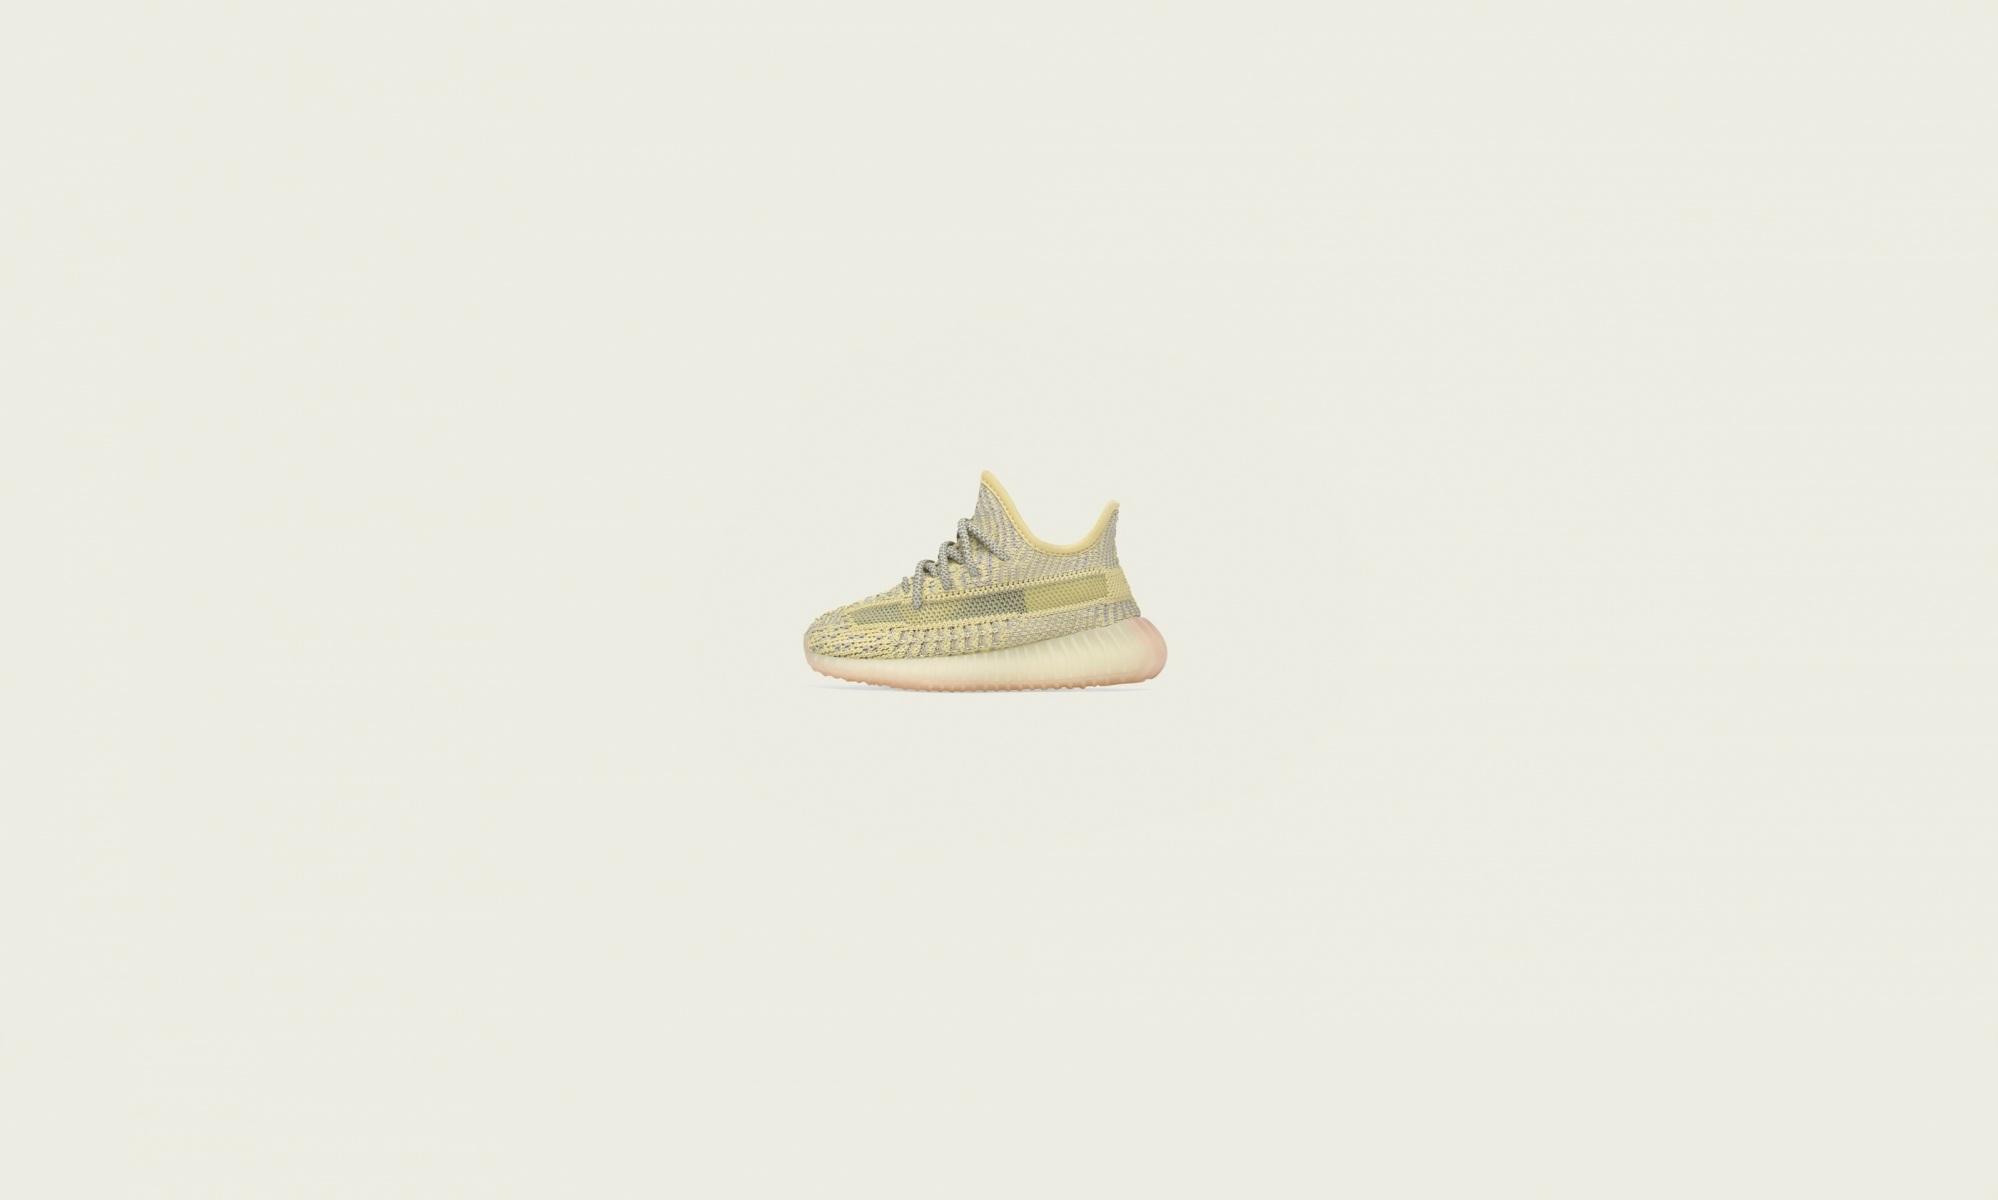 Antlia Stock V2 Adidas Boost 350 Sneakerblog InfantsDead Yeezy l1cTFKJ